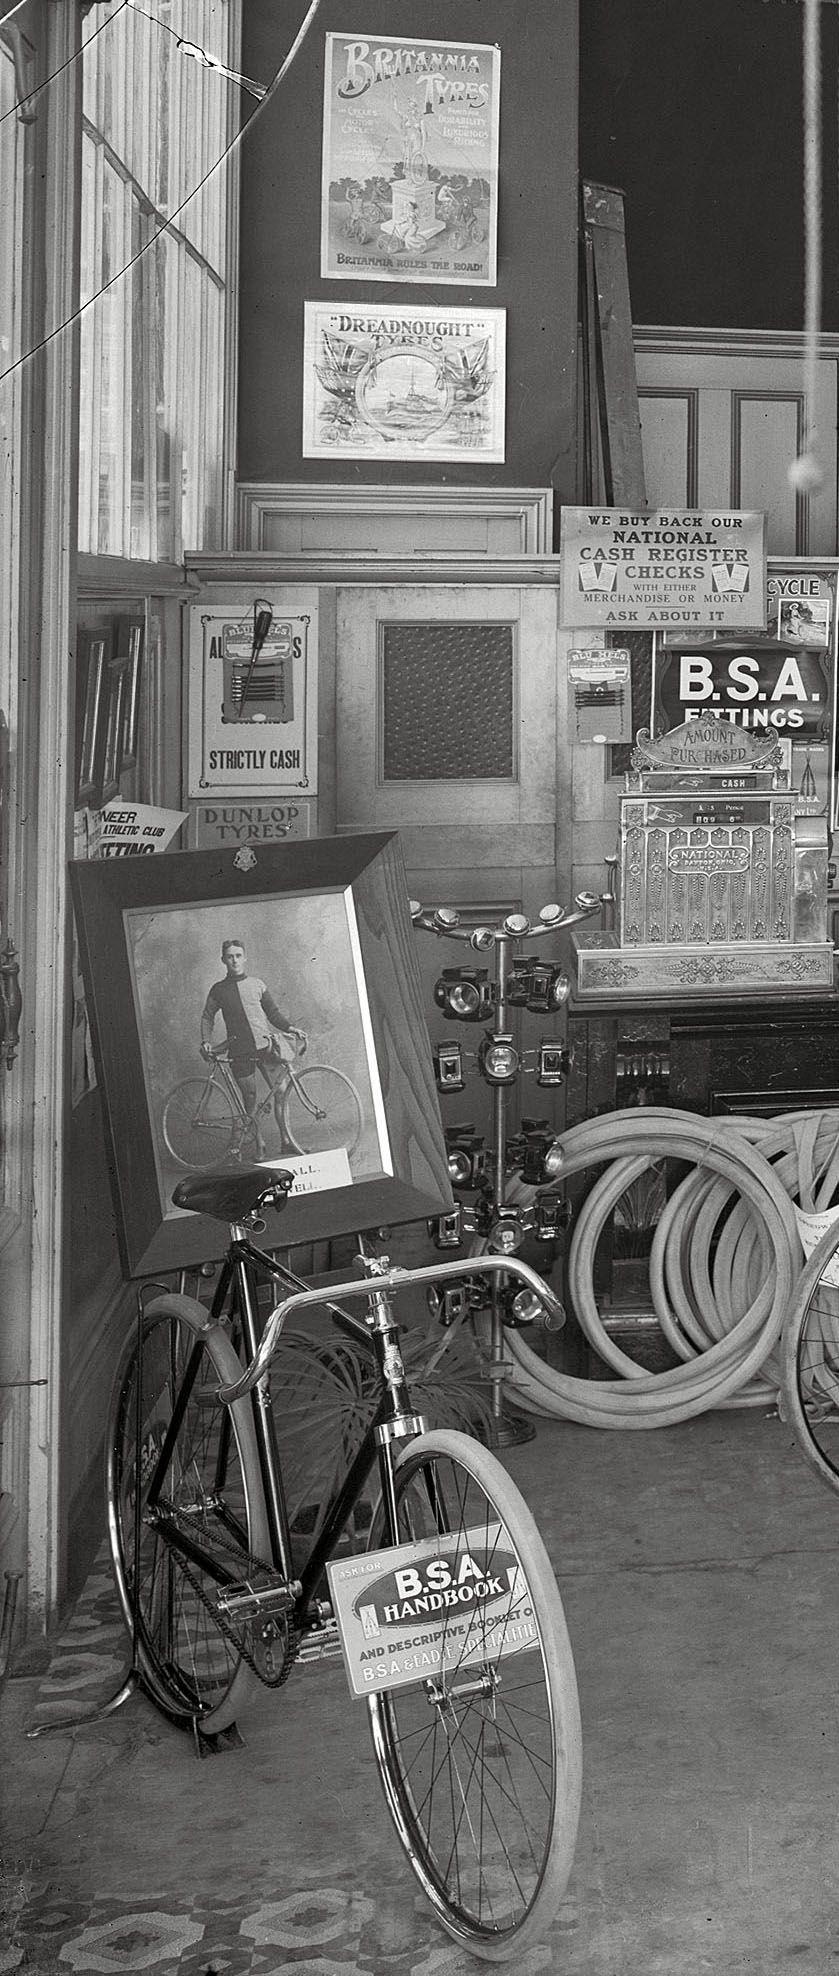 Bsa Fittings Shop Nz 2 Vintage Bike Cycle Shop Bike Brands